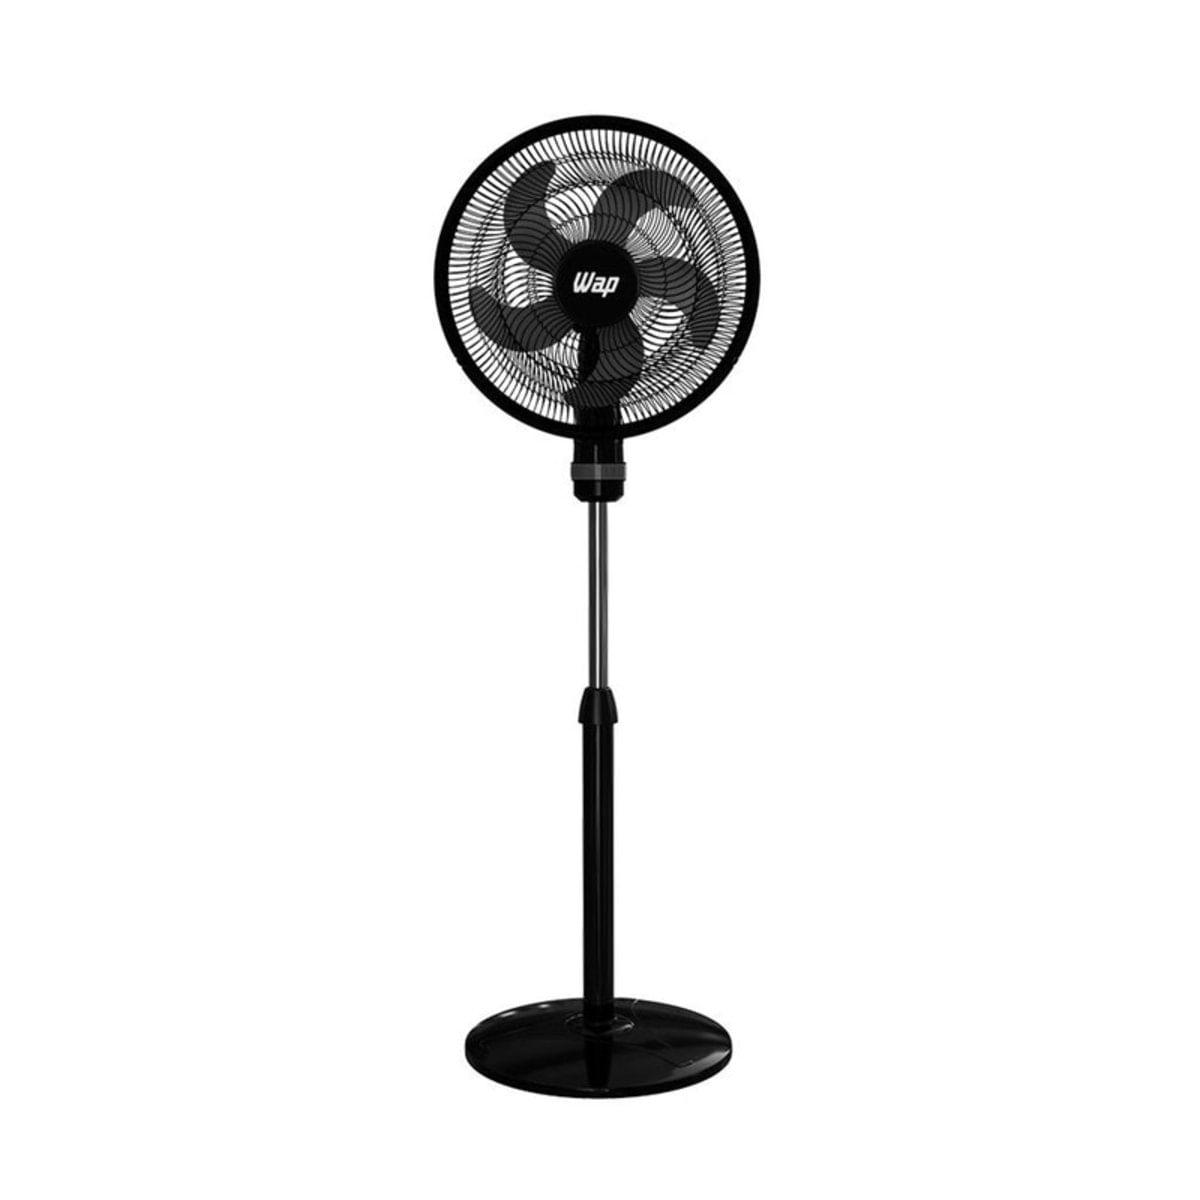 Imagem de Ventilador de Mesa Wap 5 Pás 40cm 3 Velocidades - W130